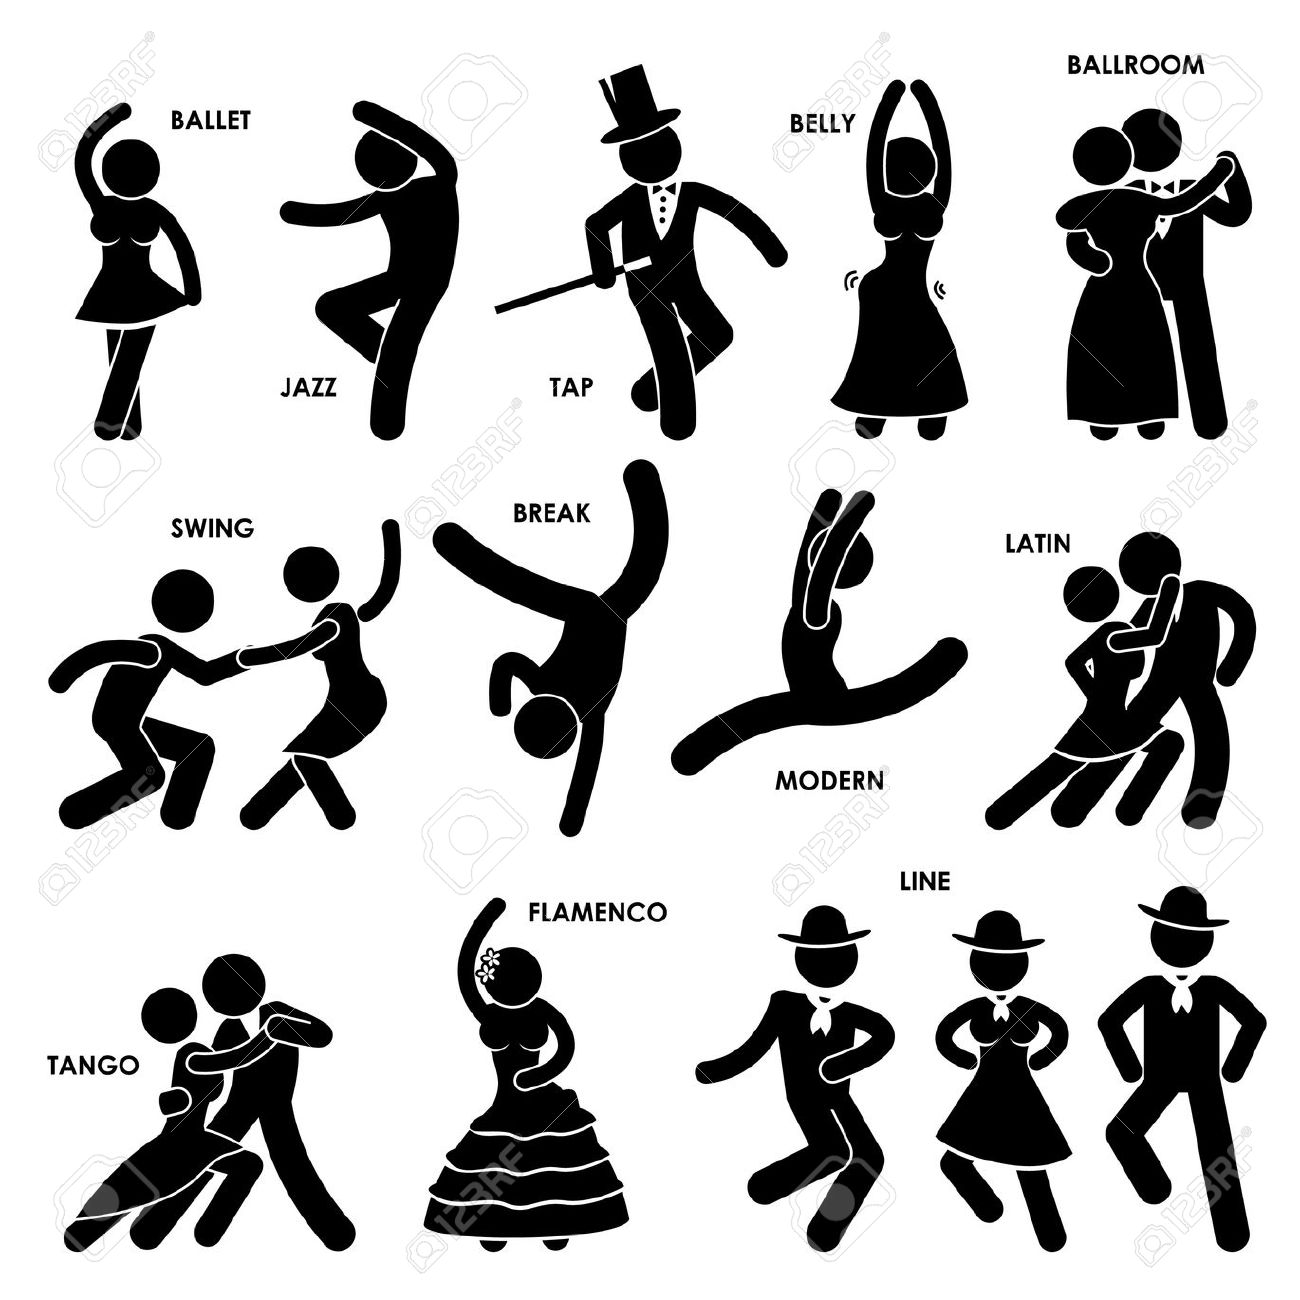 Danse clipart social dance Free Different Dancing Swing Jazz